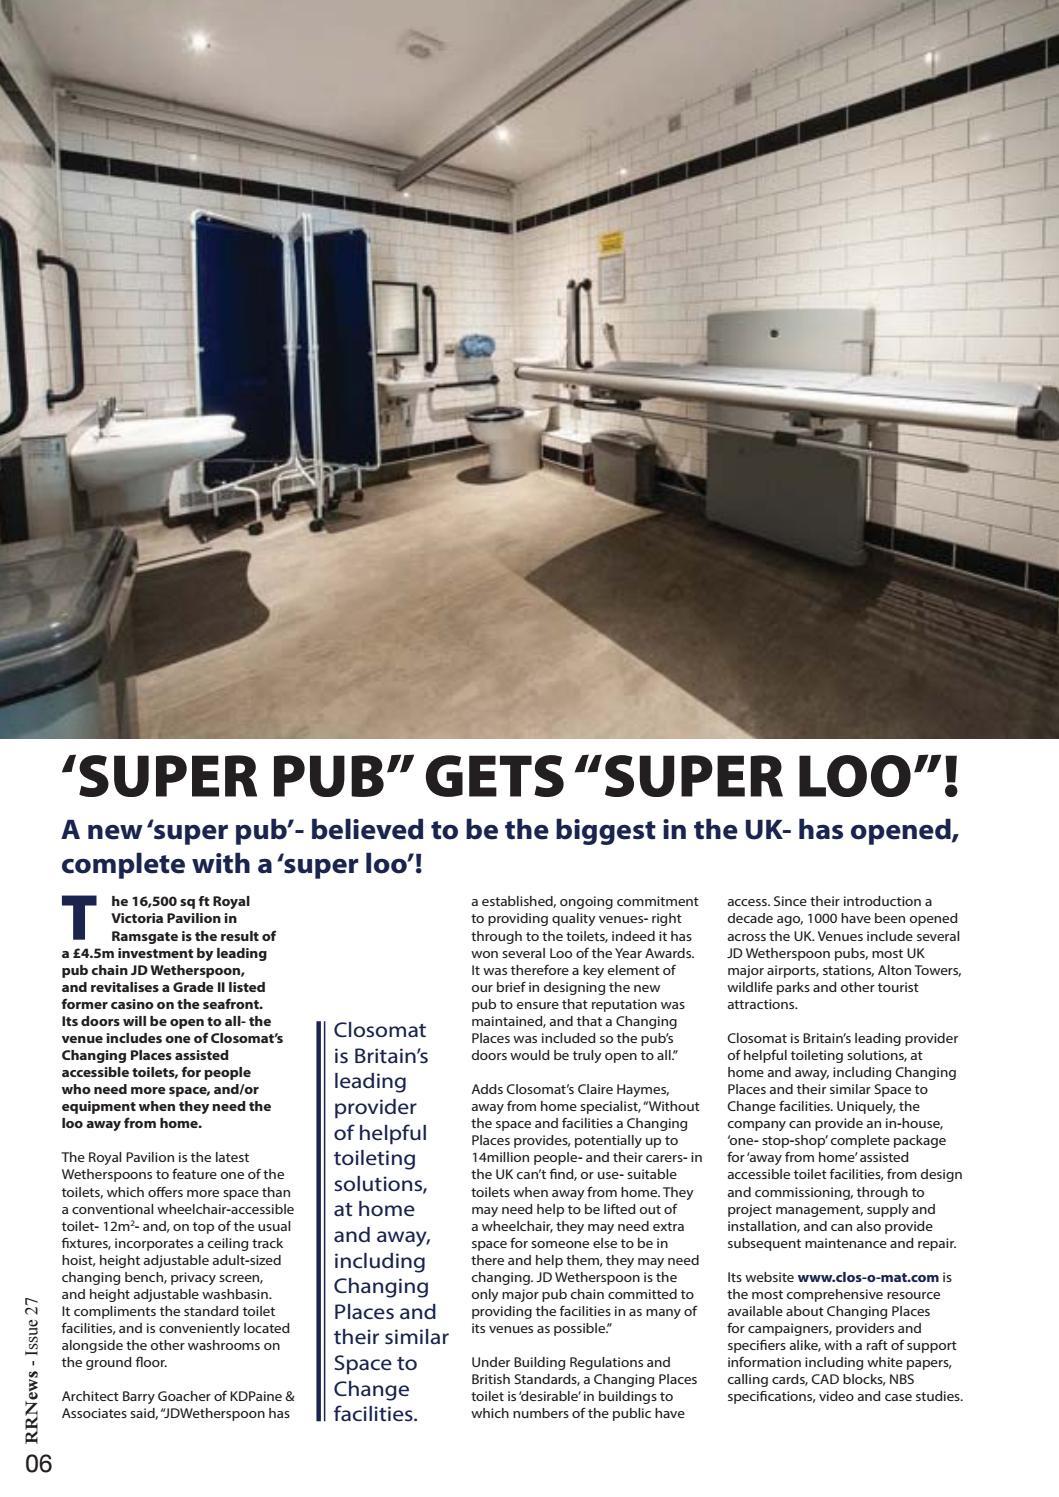 Refurb Renovation News Issue 27 by Lapthorn Media - issuu